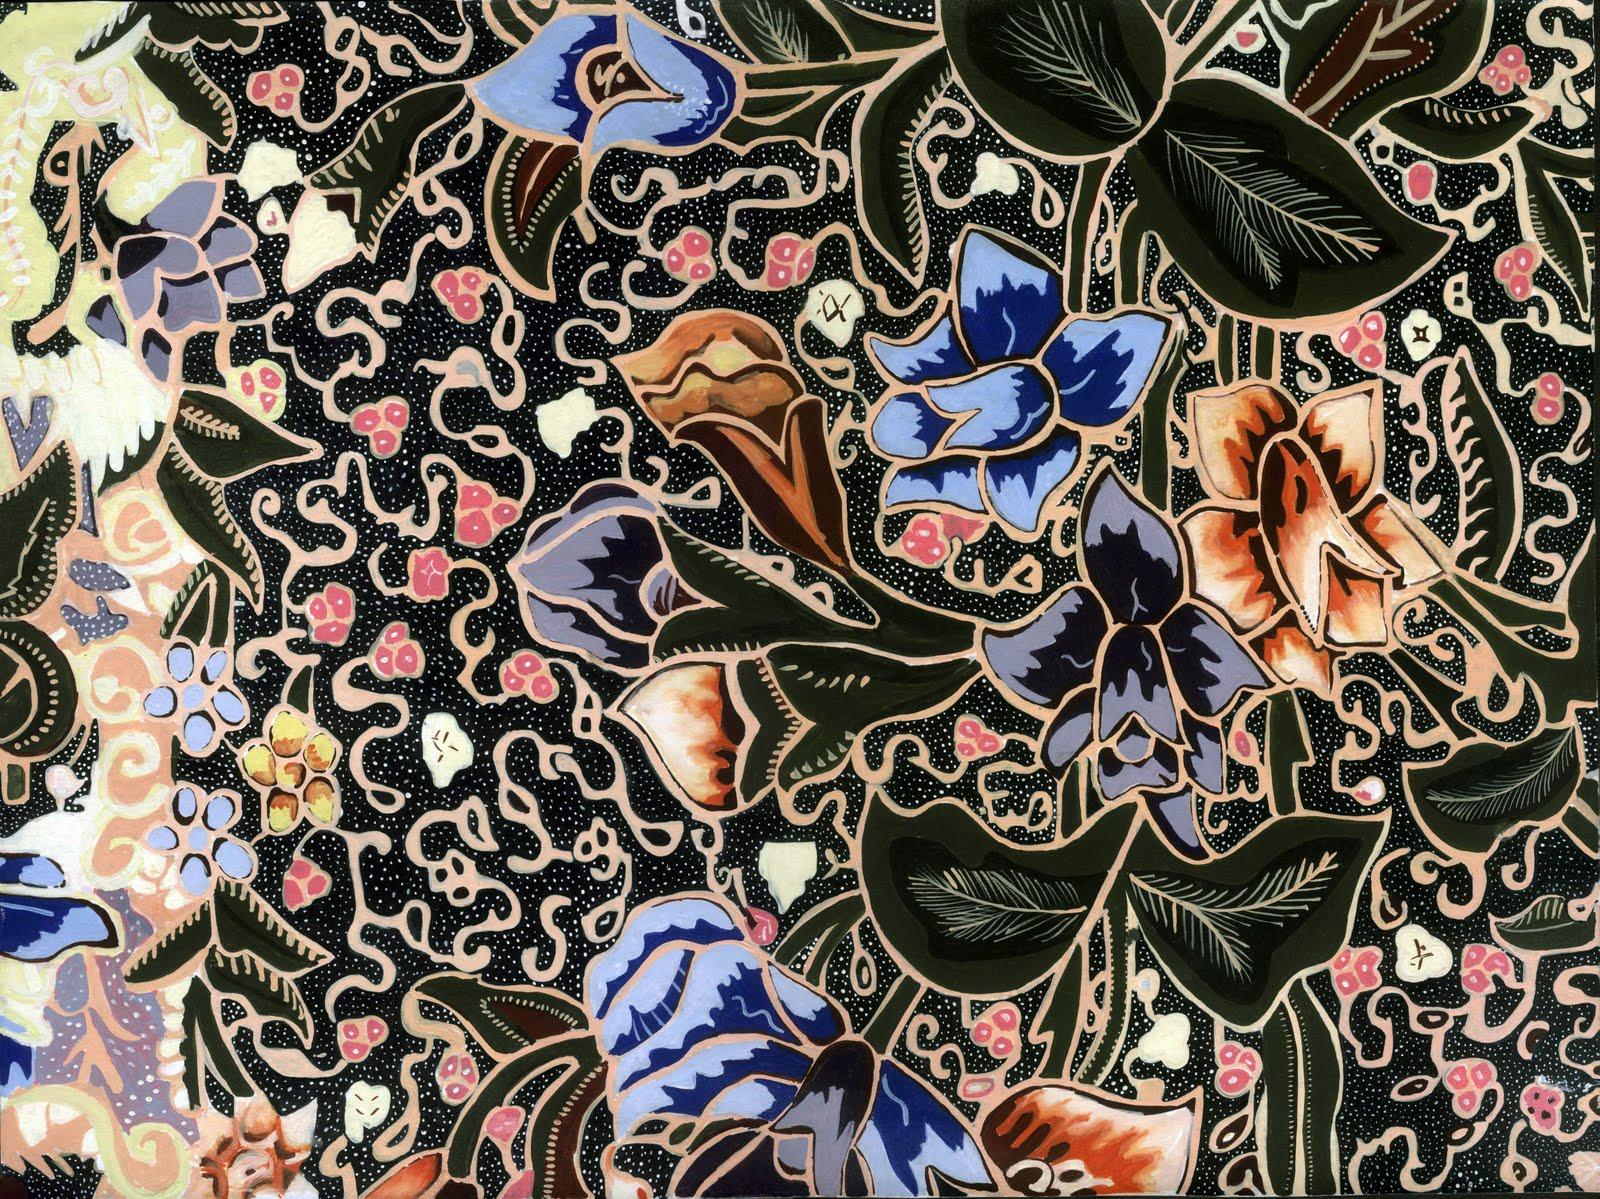 pesisir batik motif keraton batik east java batik motif in sumatera ...